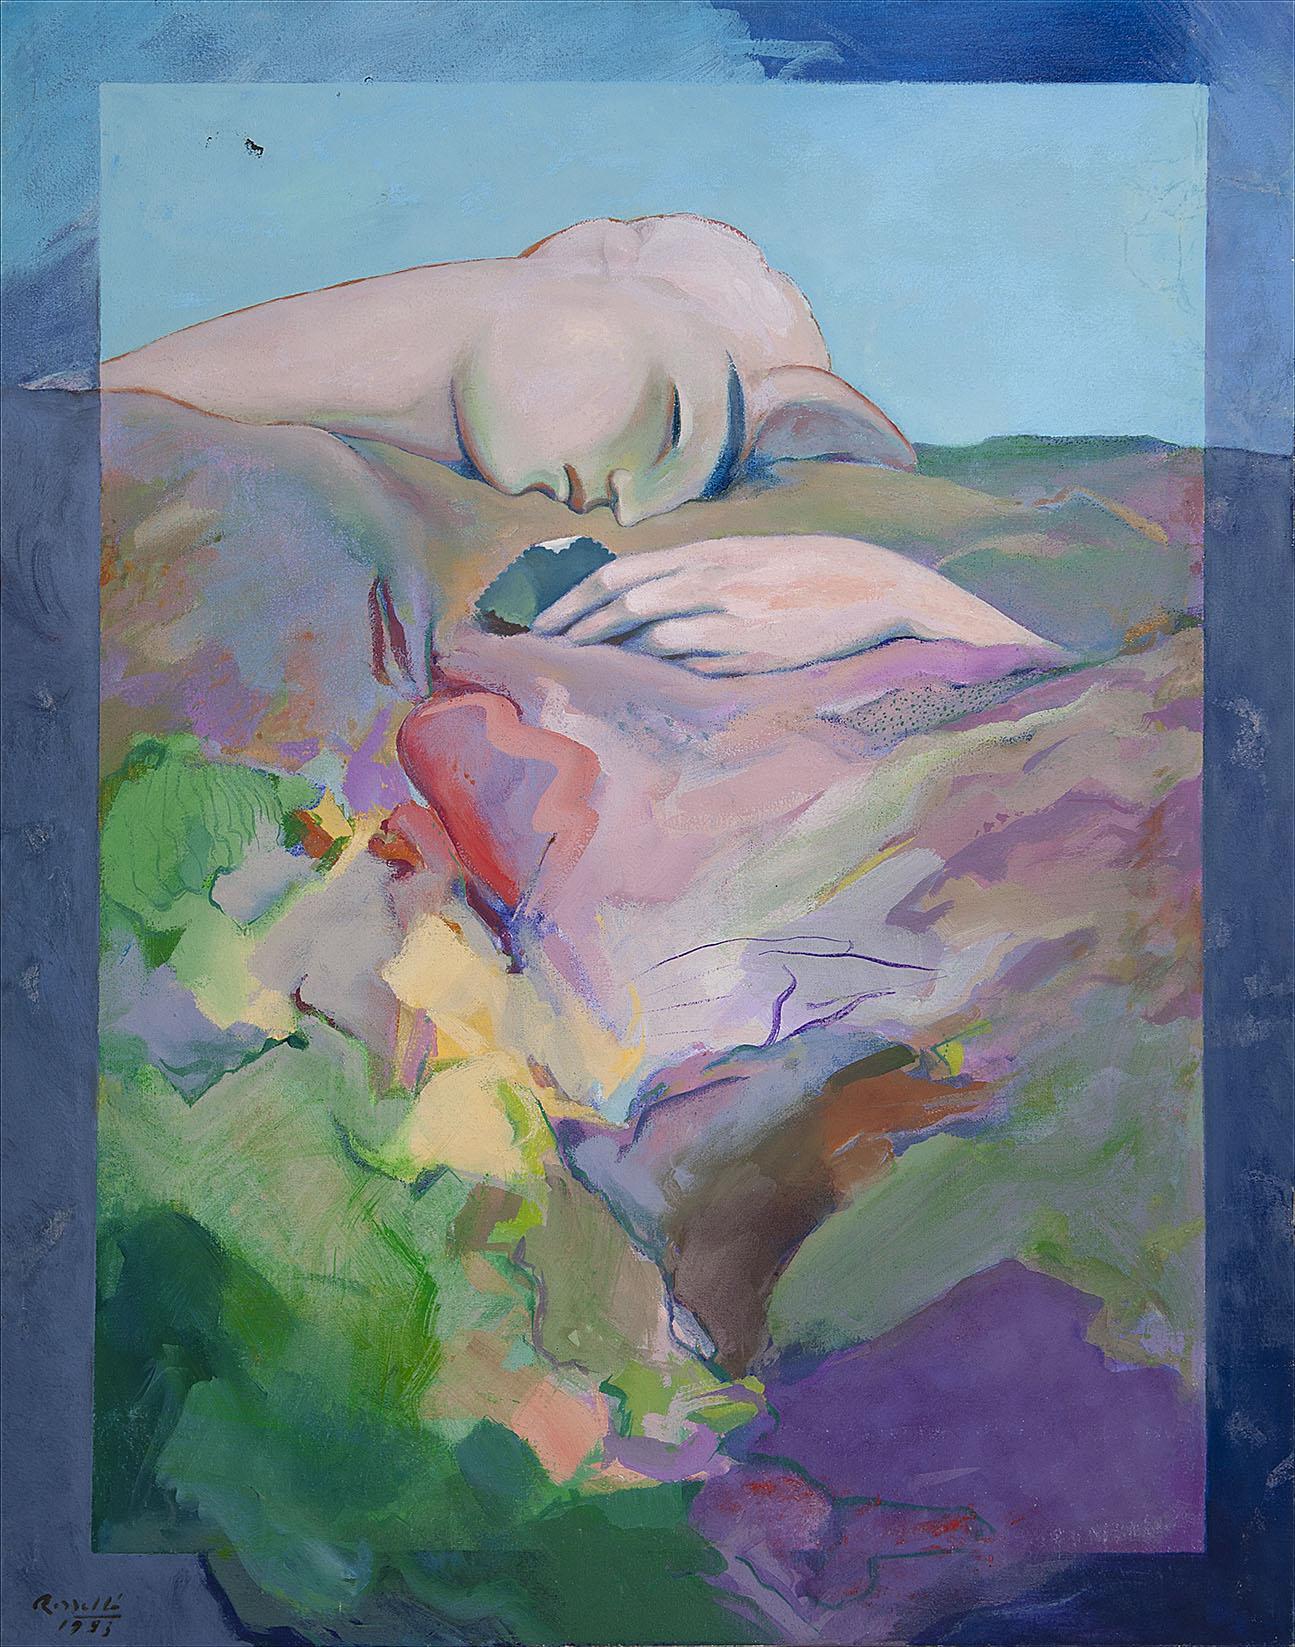 El faune somiador   Rosselló ( Roselló Virgili, Josep M)